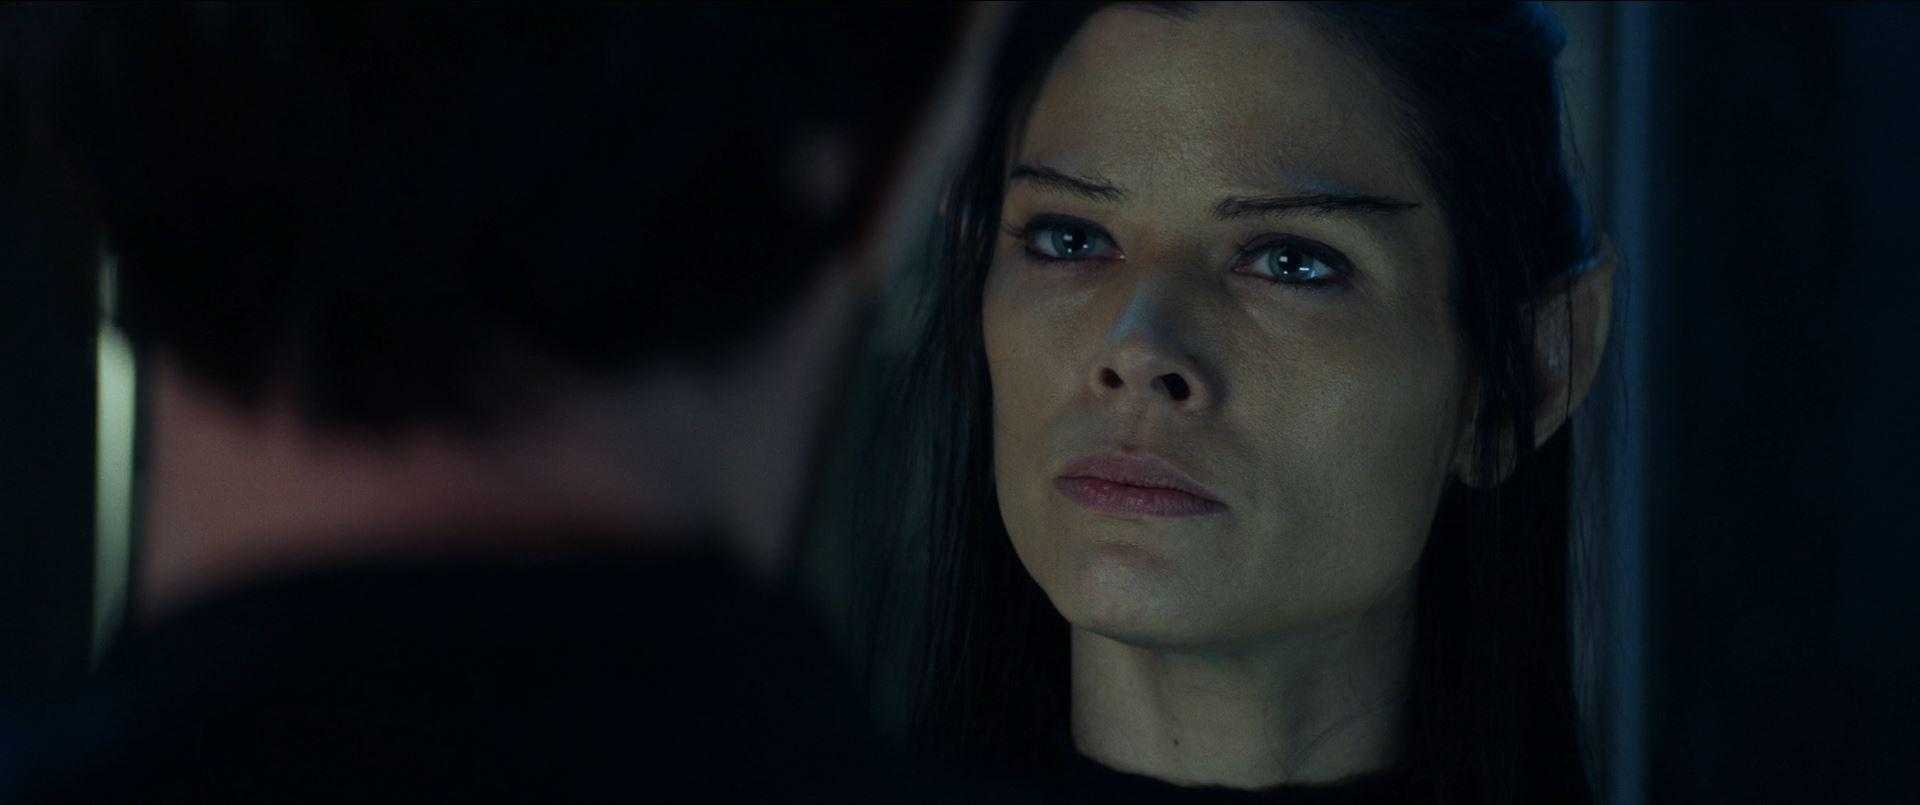 Star Trek Picard S01E10 Et in Arcadia Ego Part 2 Review - Peyton List as Narissa